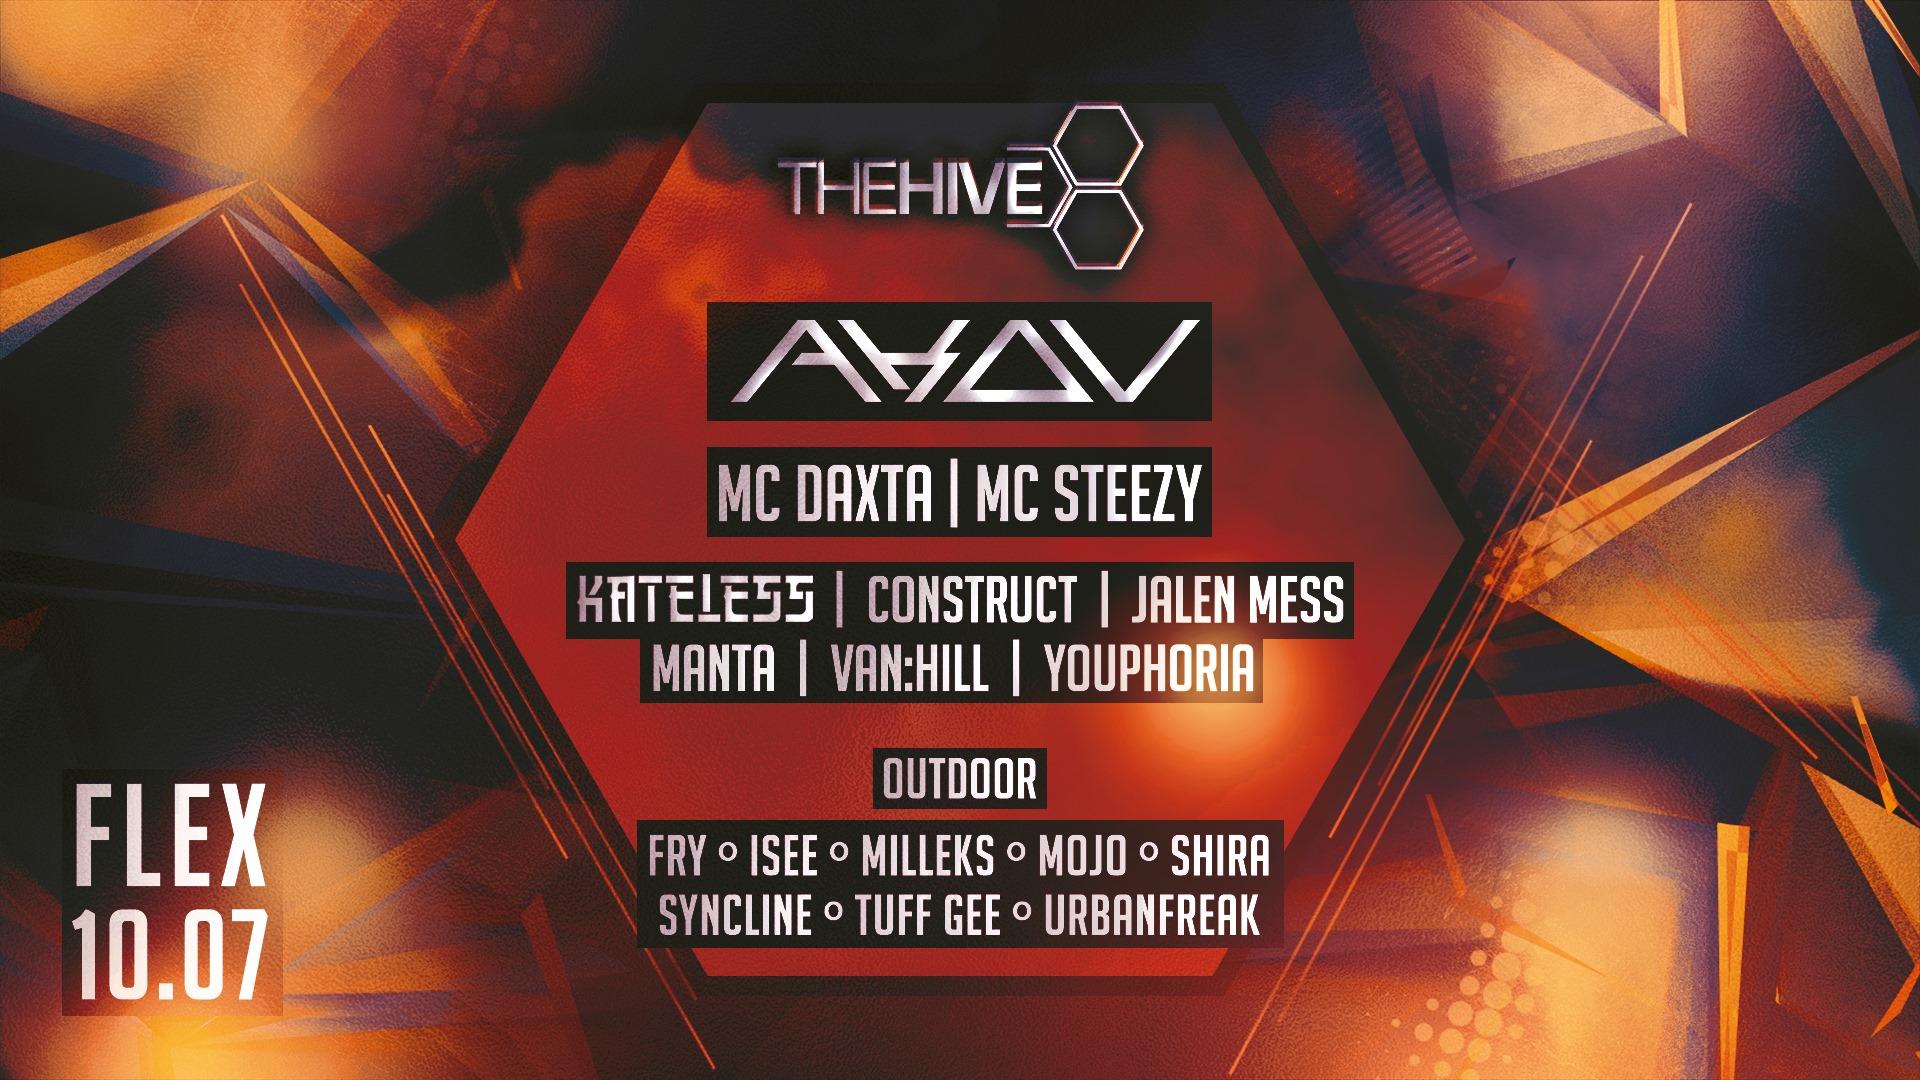 Events Wien: THE HIVE pres. AKOV & MC DAXTA